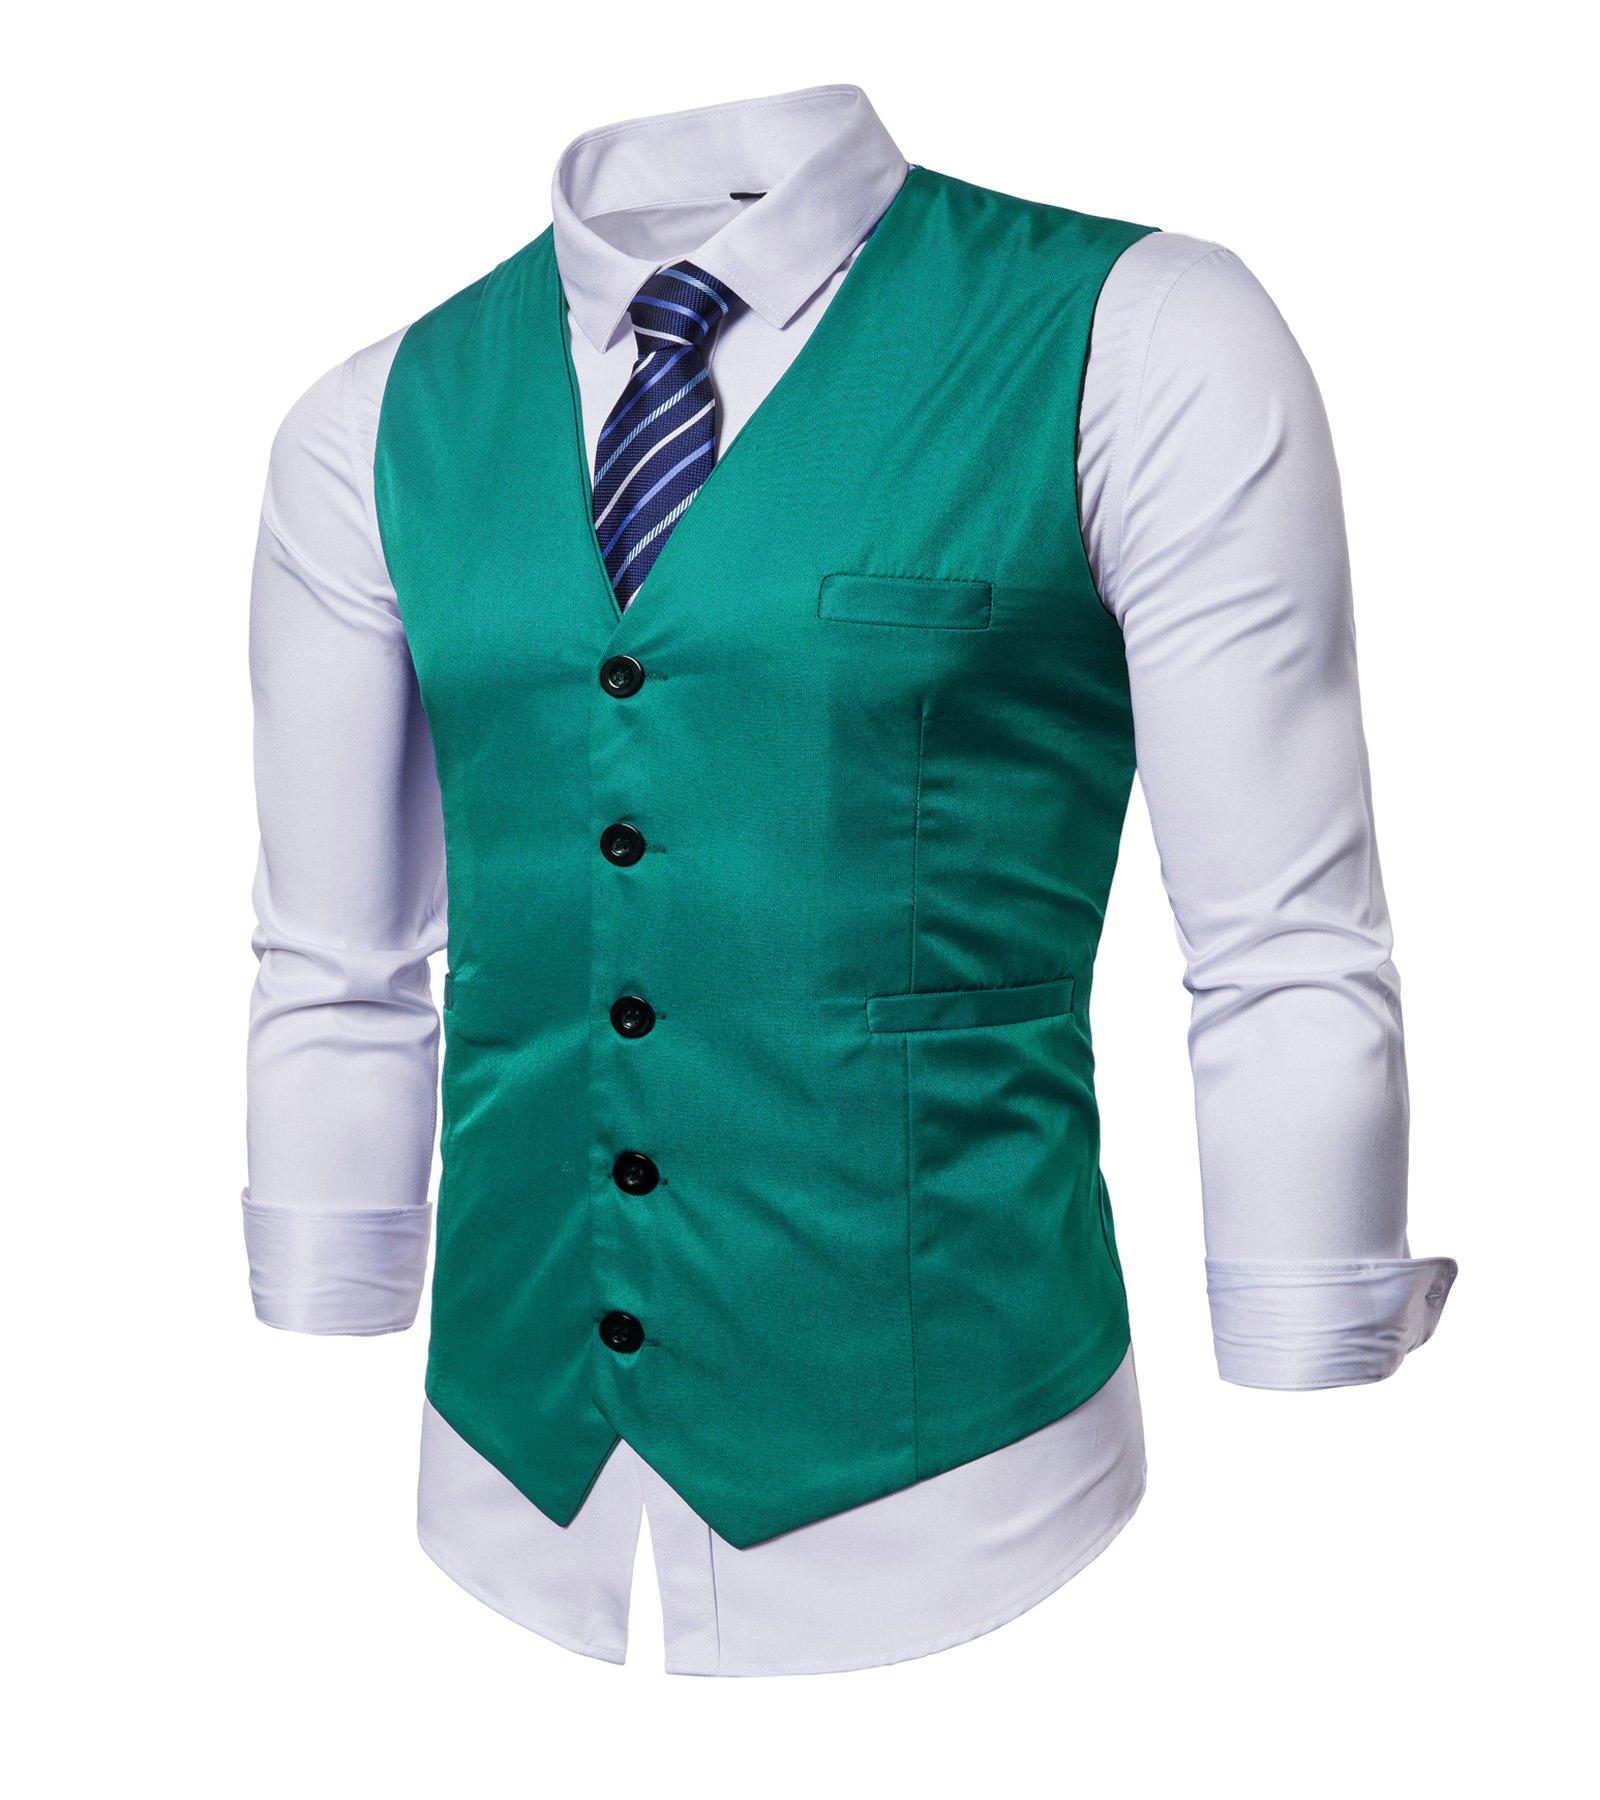 AOQ Men's Casual Slim Fit Business Suit Vests Waistcoat for Suit or Tuxedo